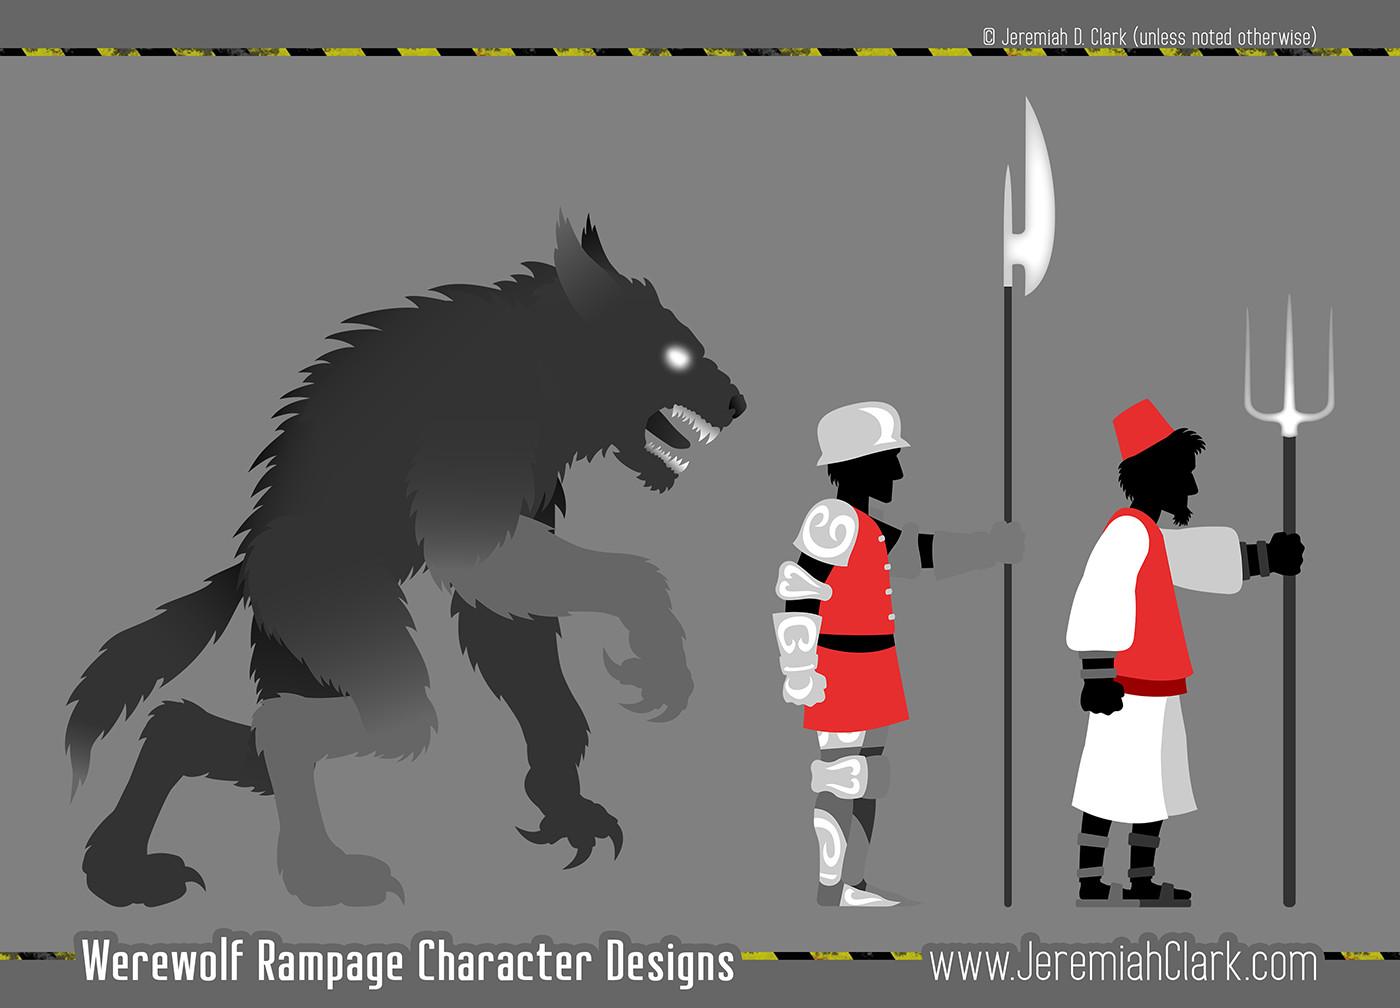 Jeremiah clark jdc portfolio werewolframpagecharacters